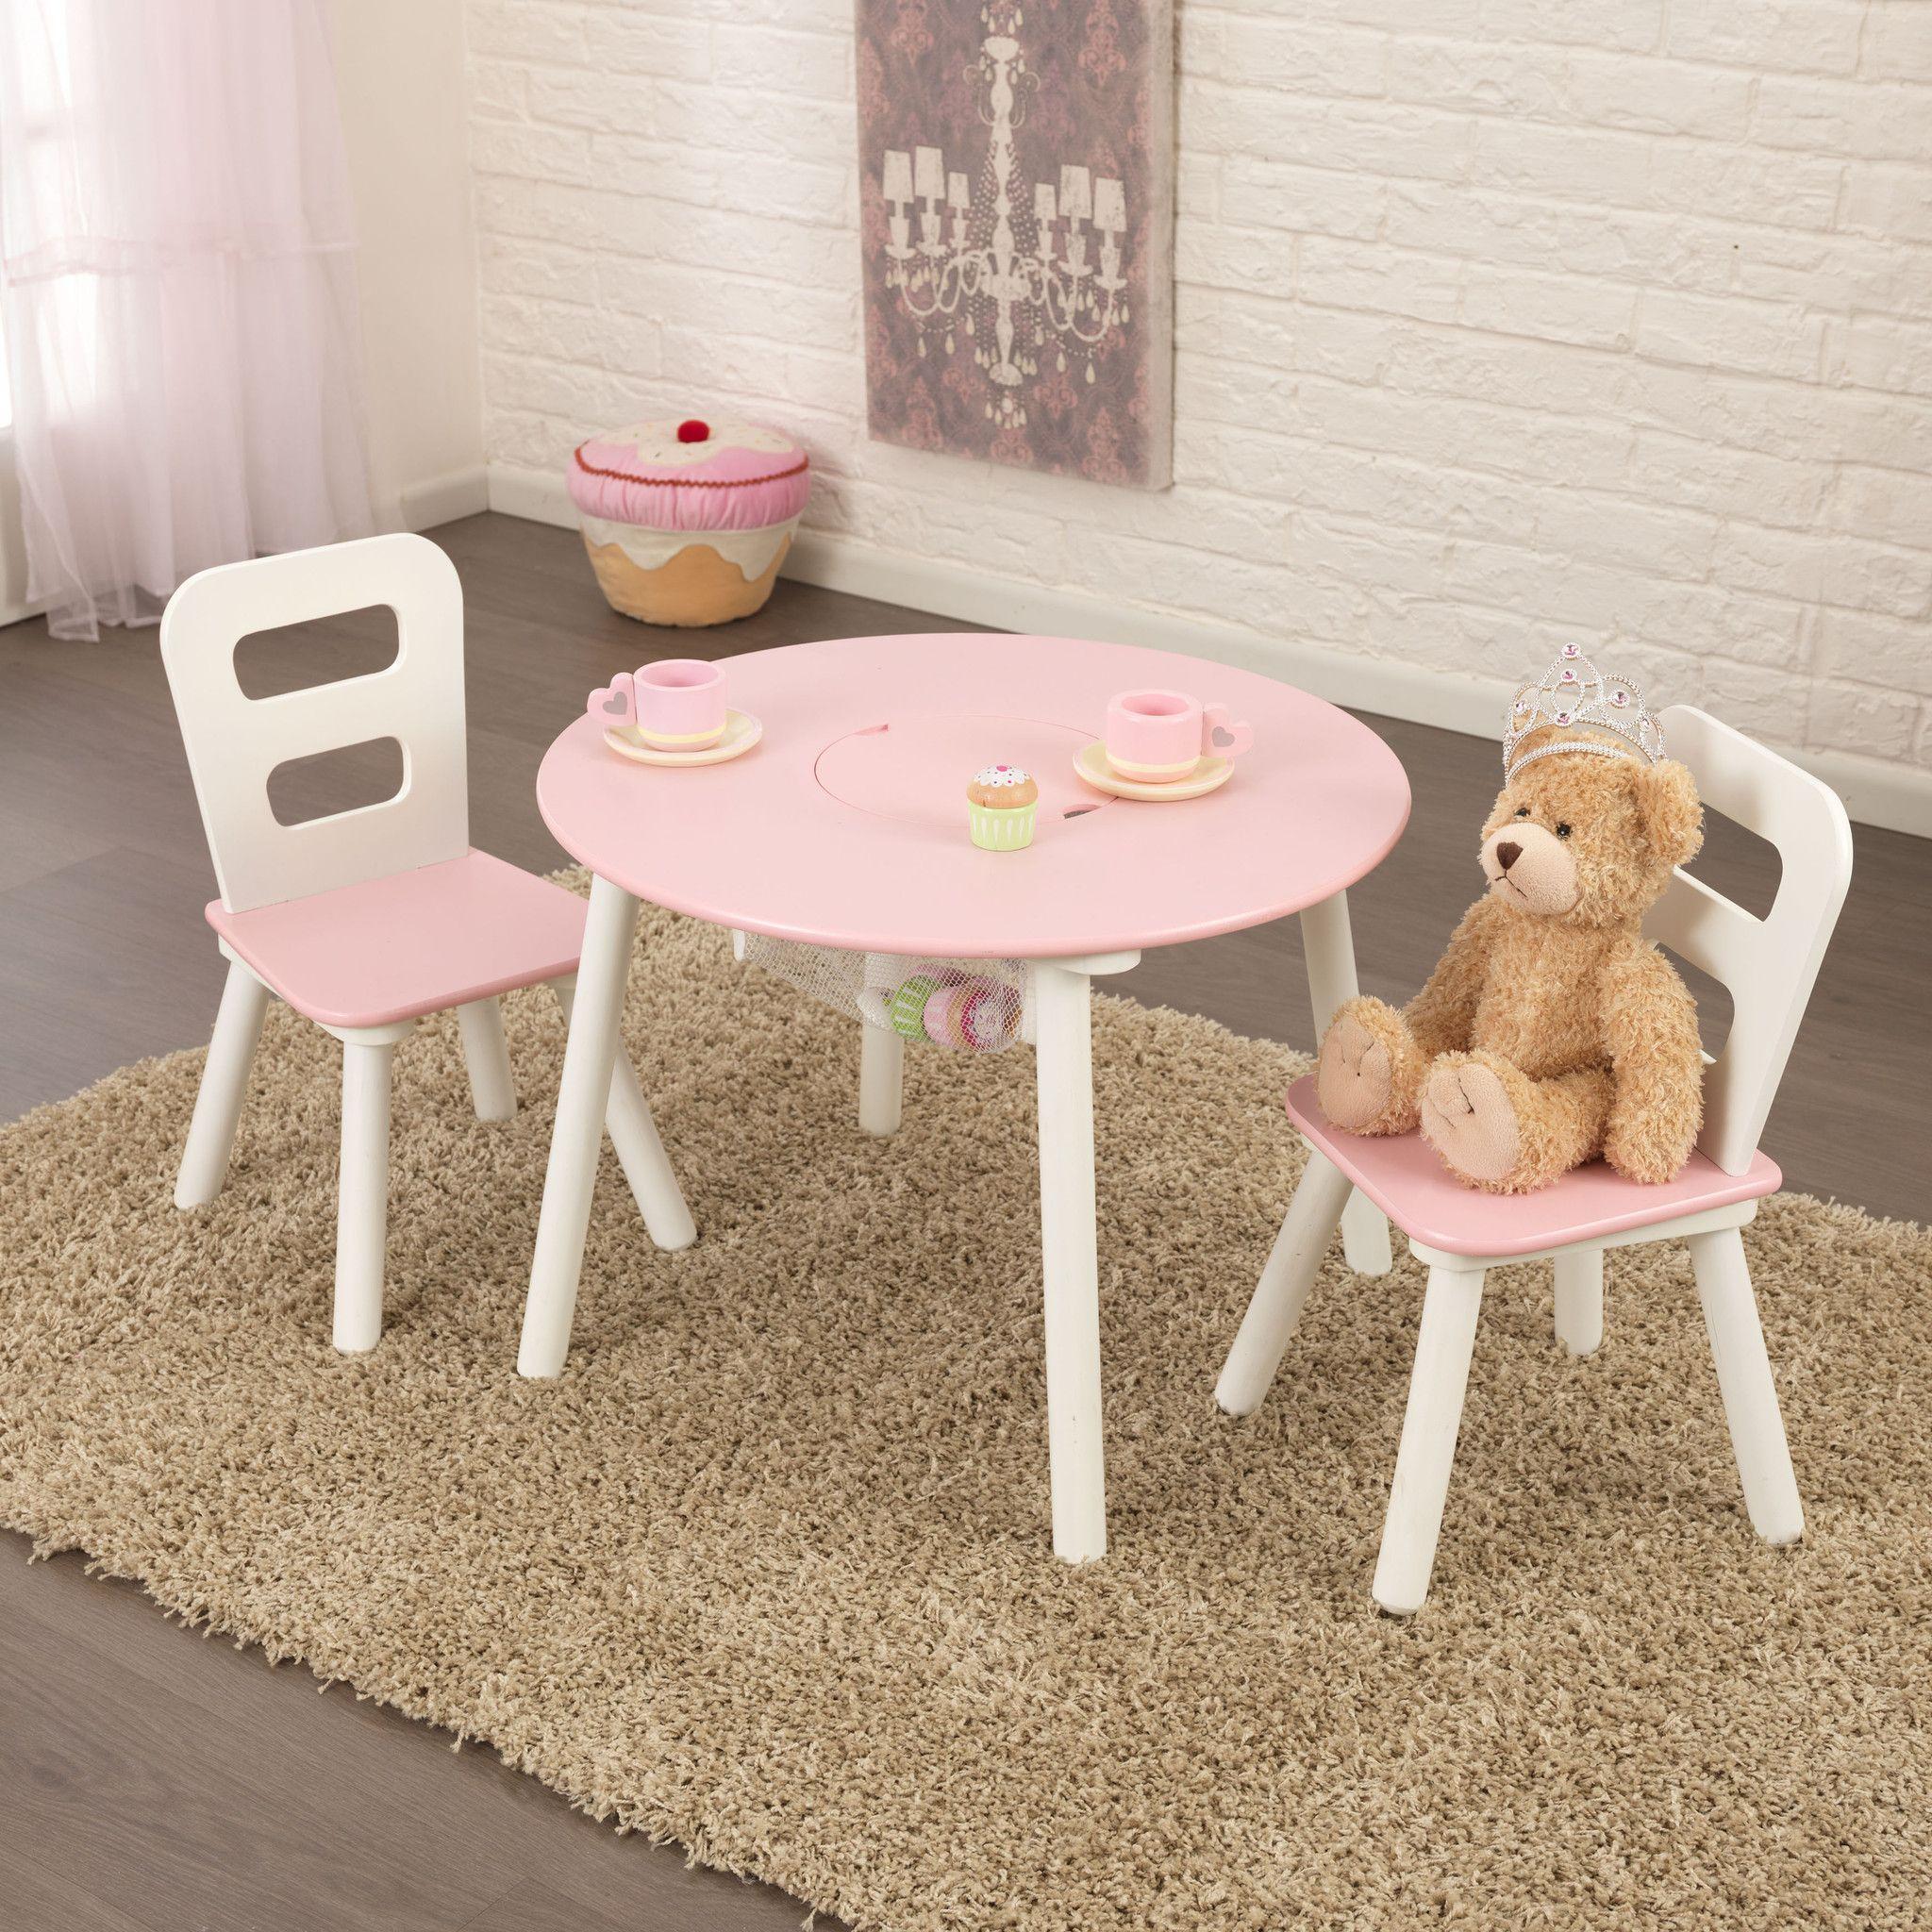 amazon games dp toys set espresso com avalon chair kidkraft table and square